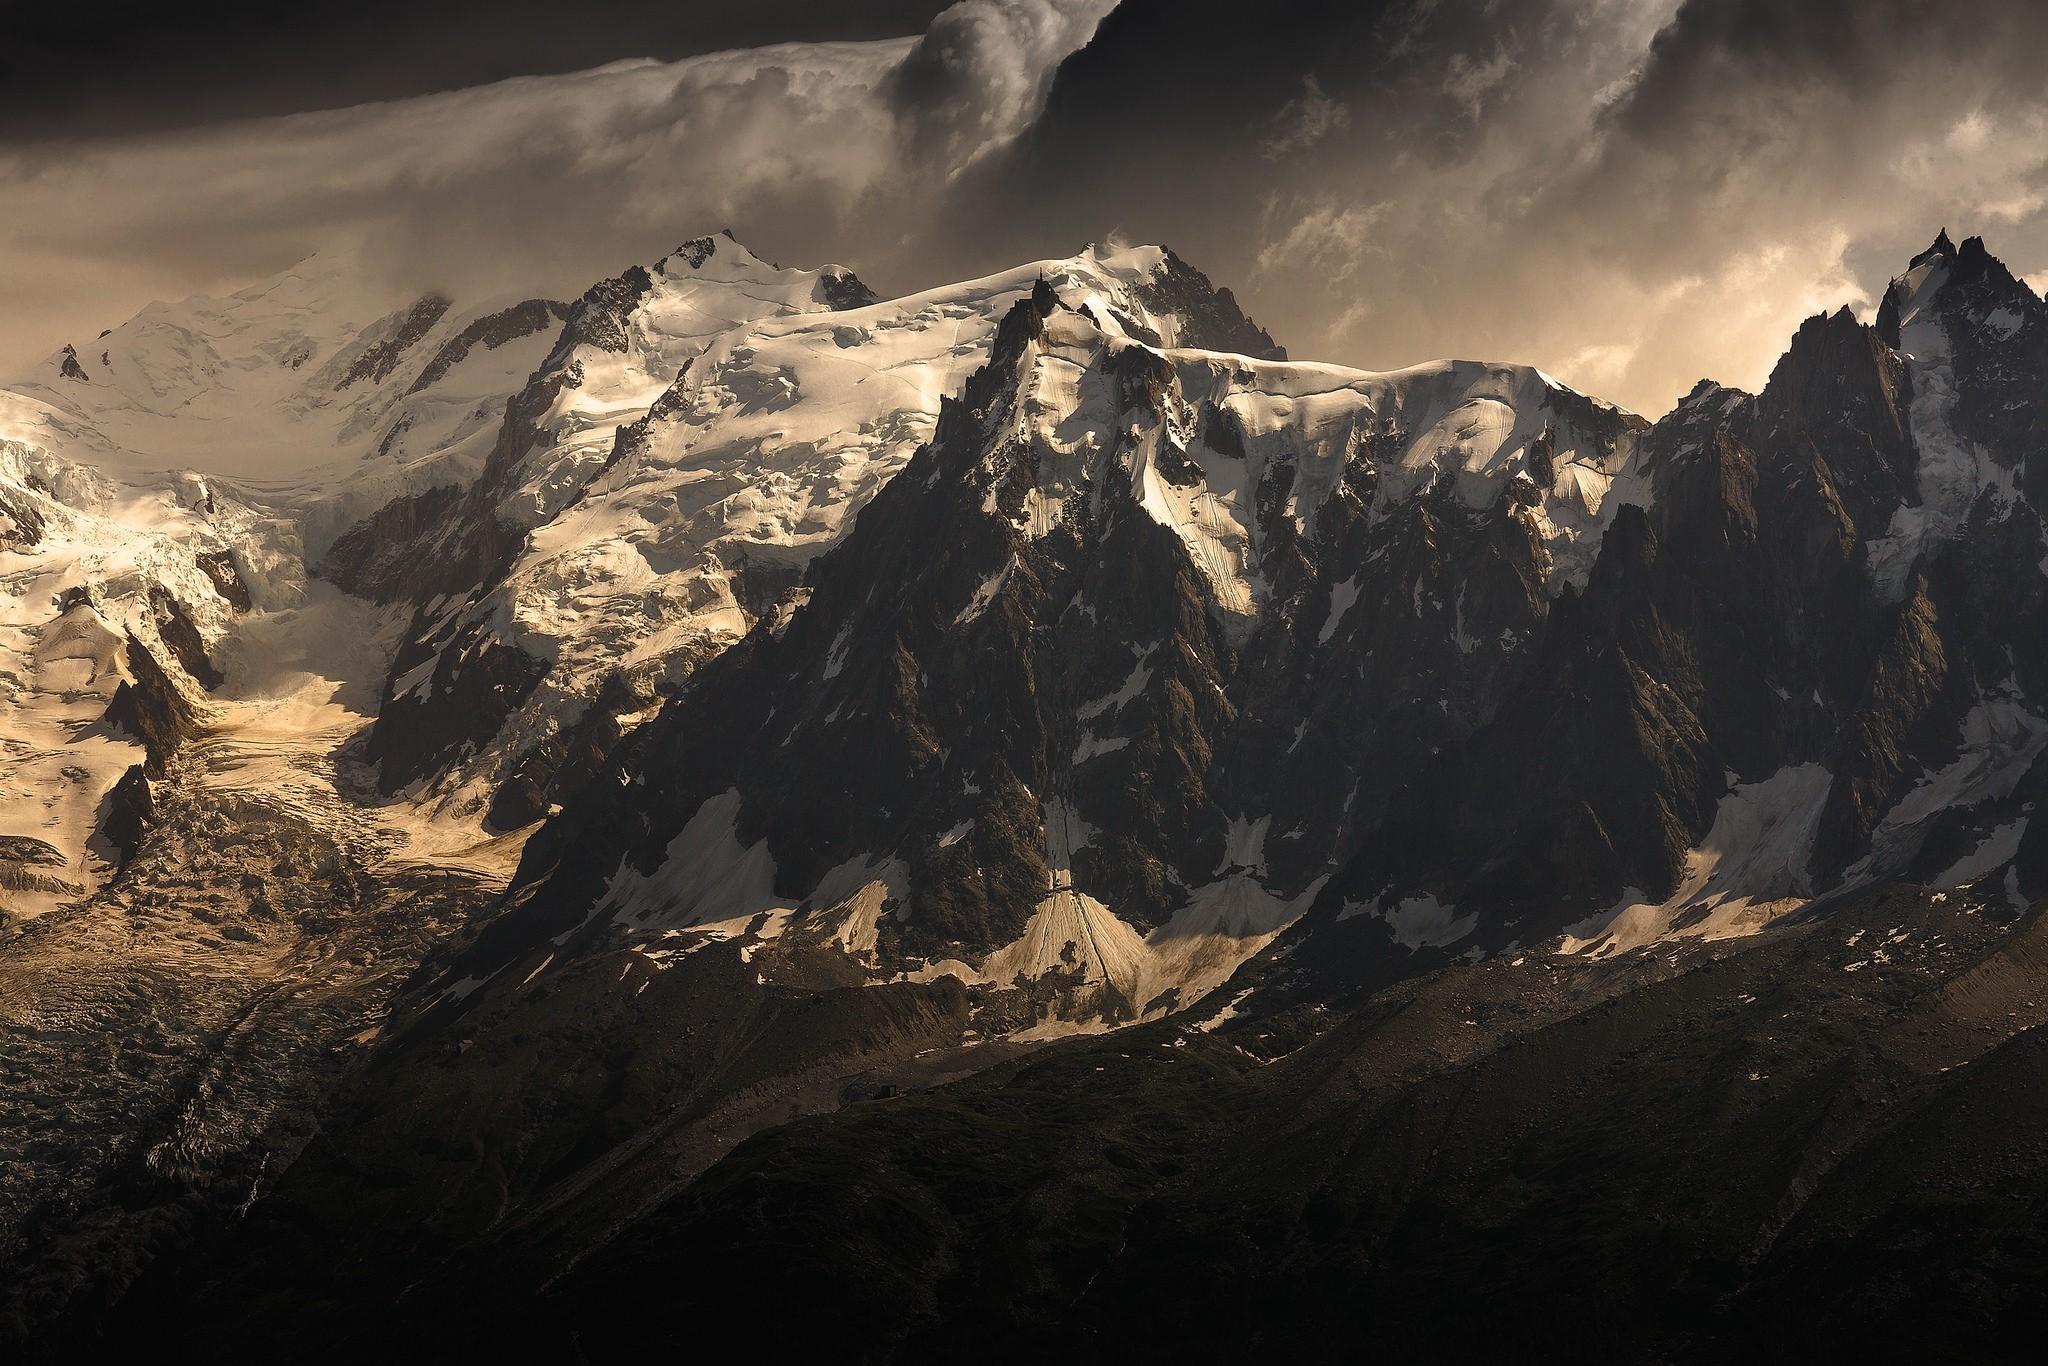 Everest wallpaper wallpapertag - Mount everest wallpaper ...